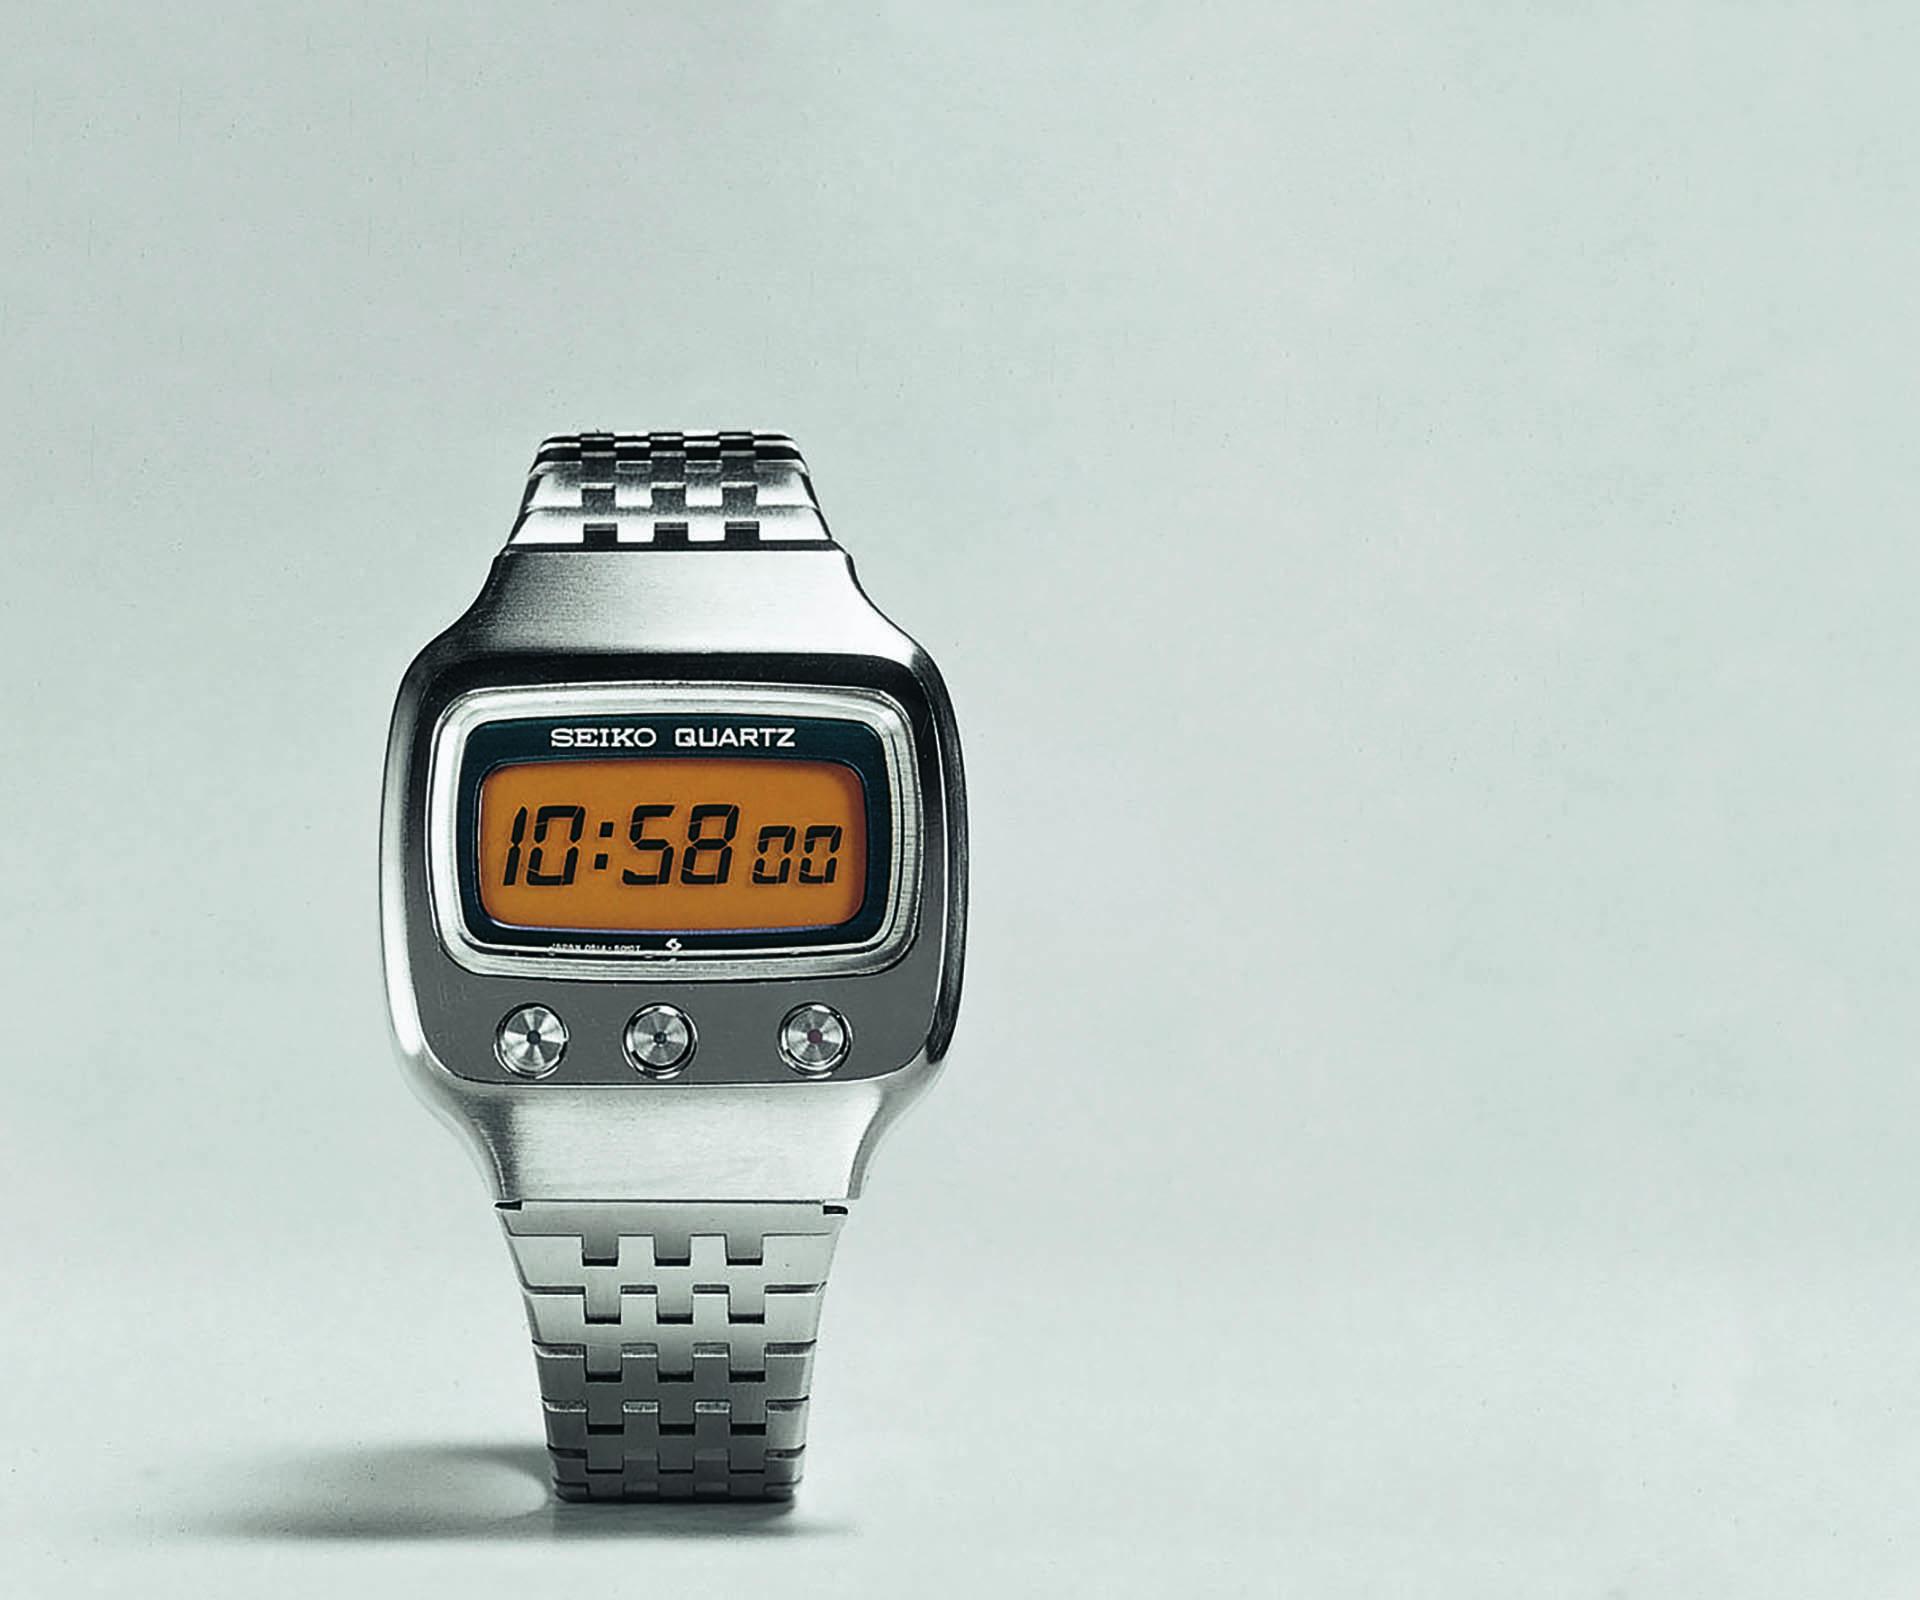 Seiko Quarzuhr LCD